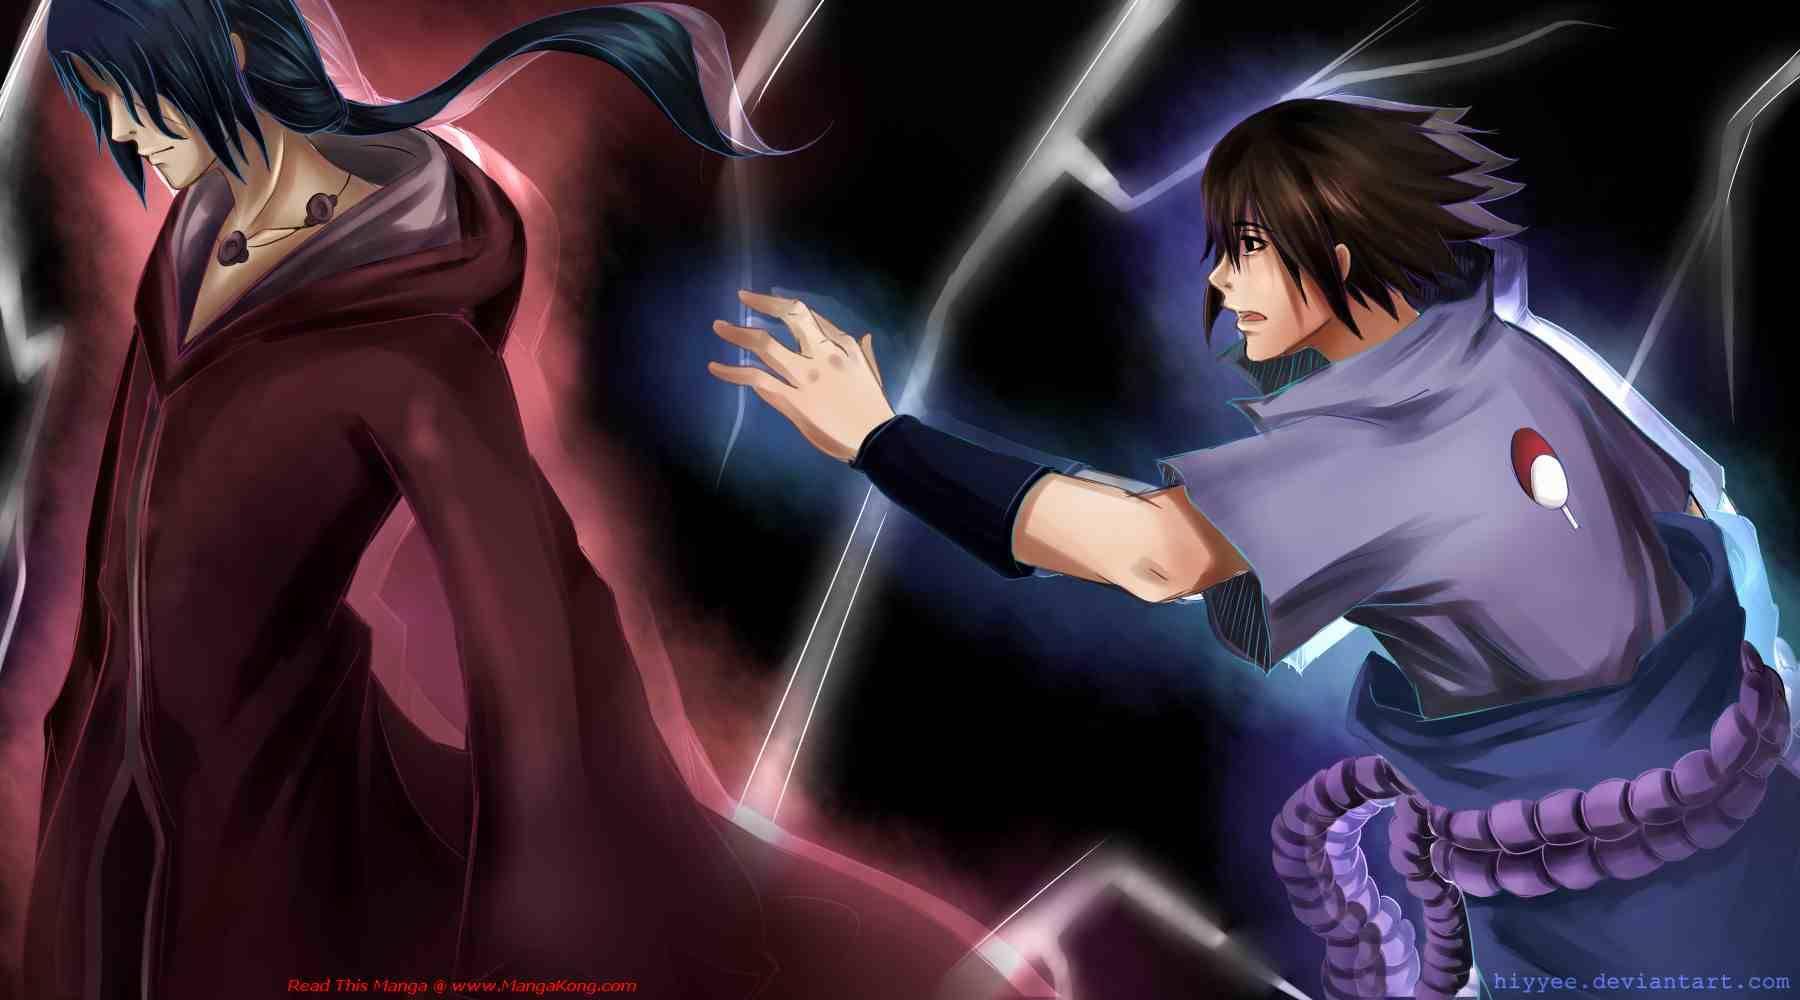 Sasuke Vs Itachi Wallpapers Posted By Ryan Sellers